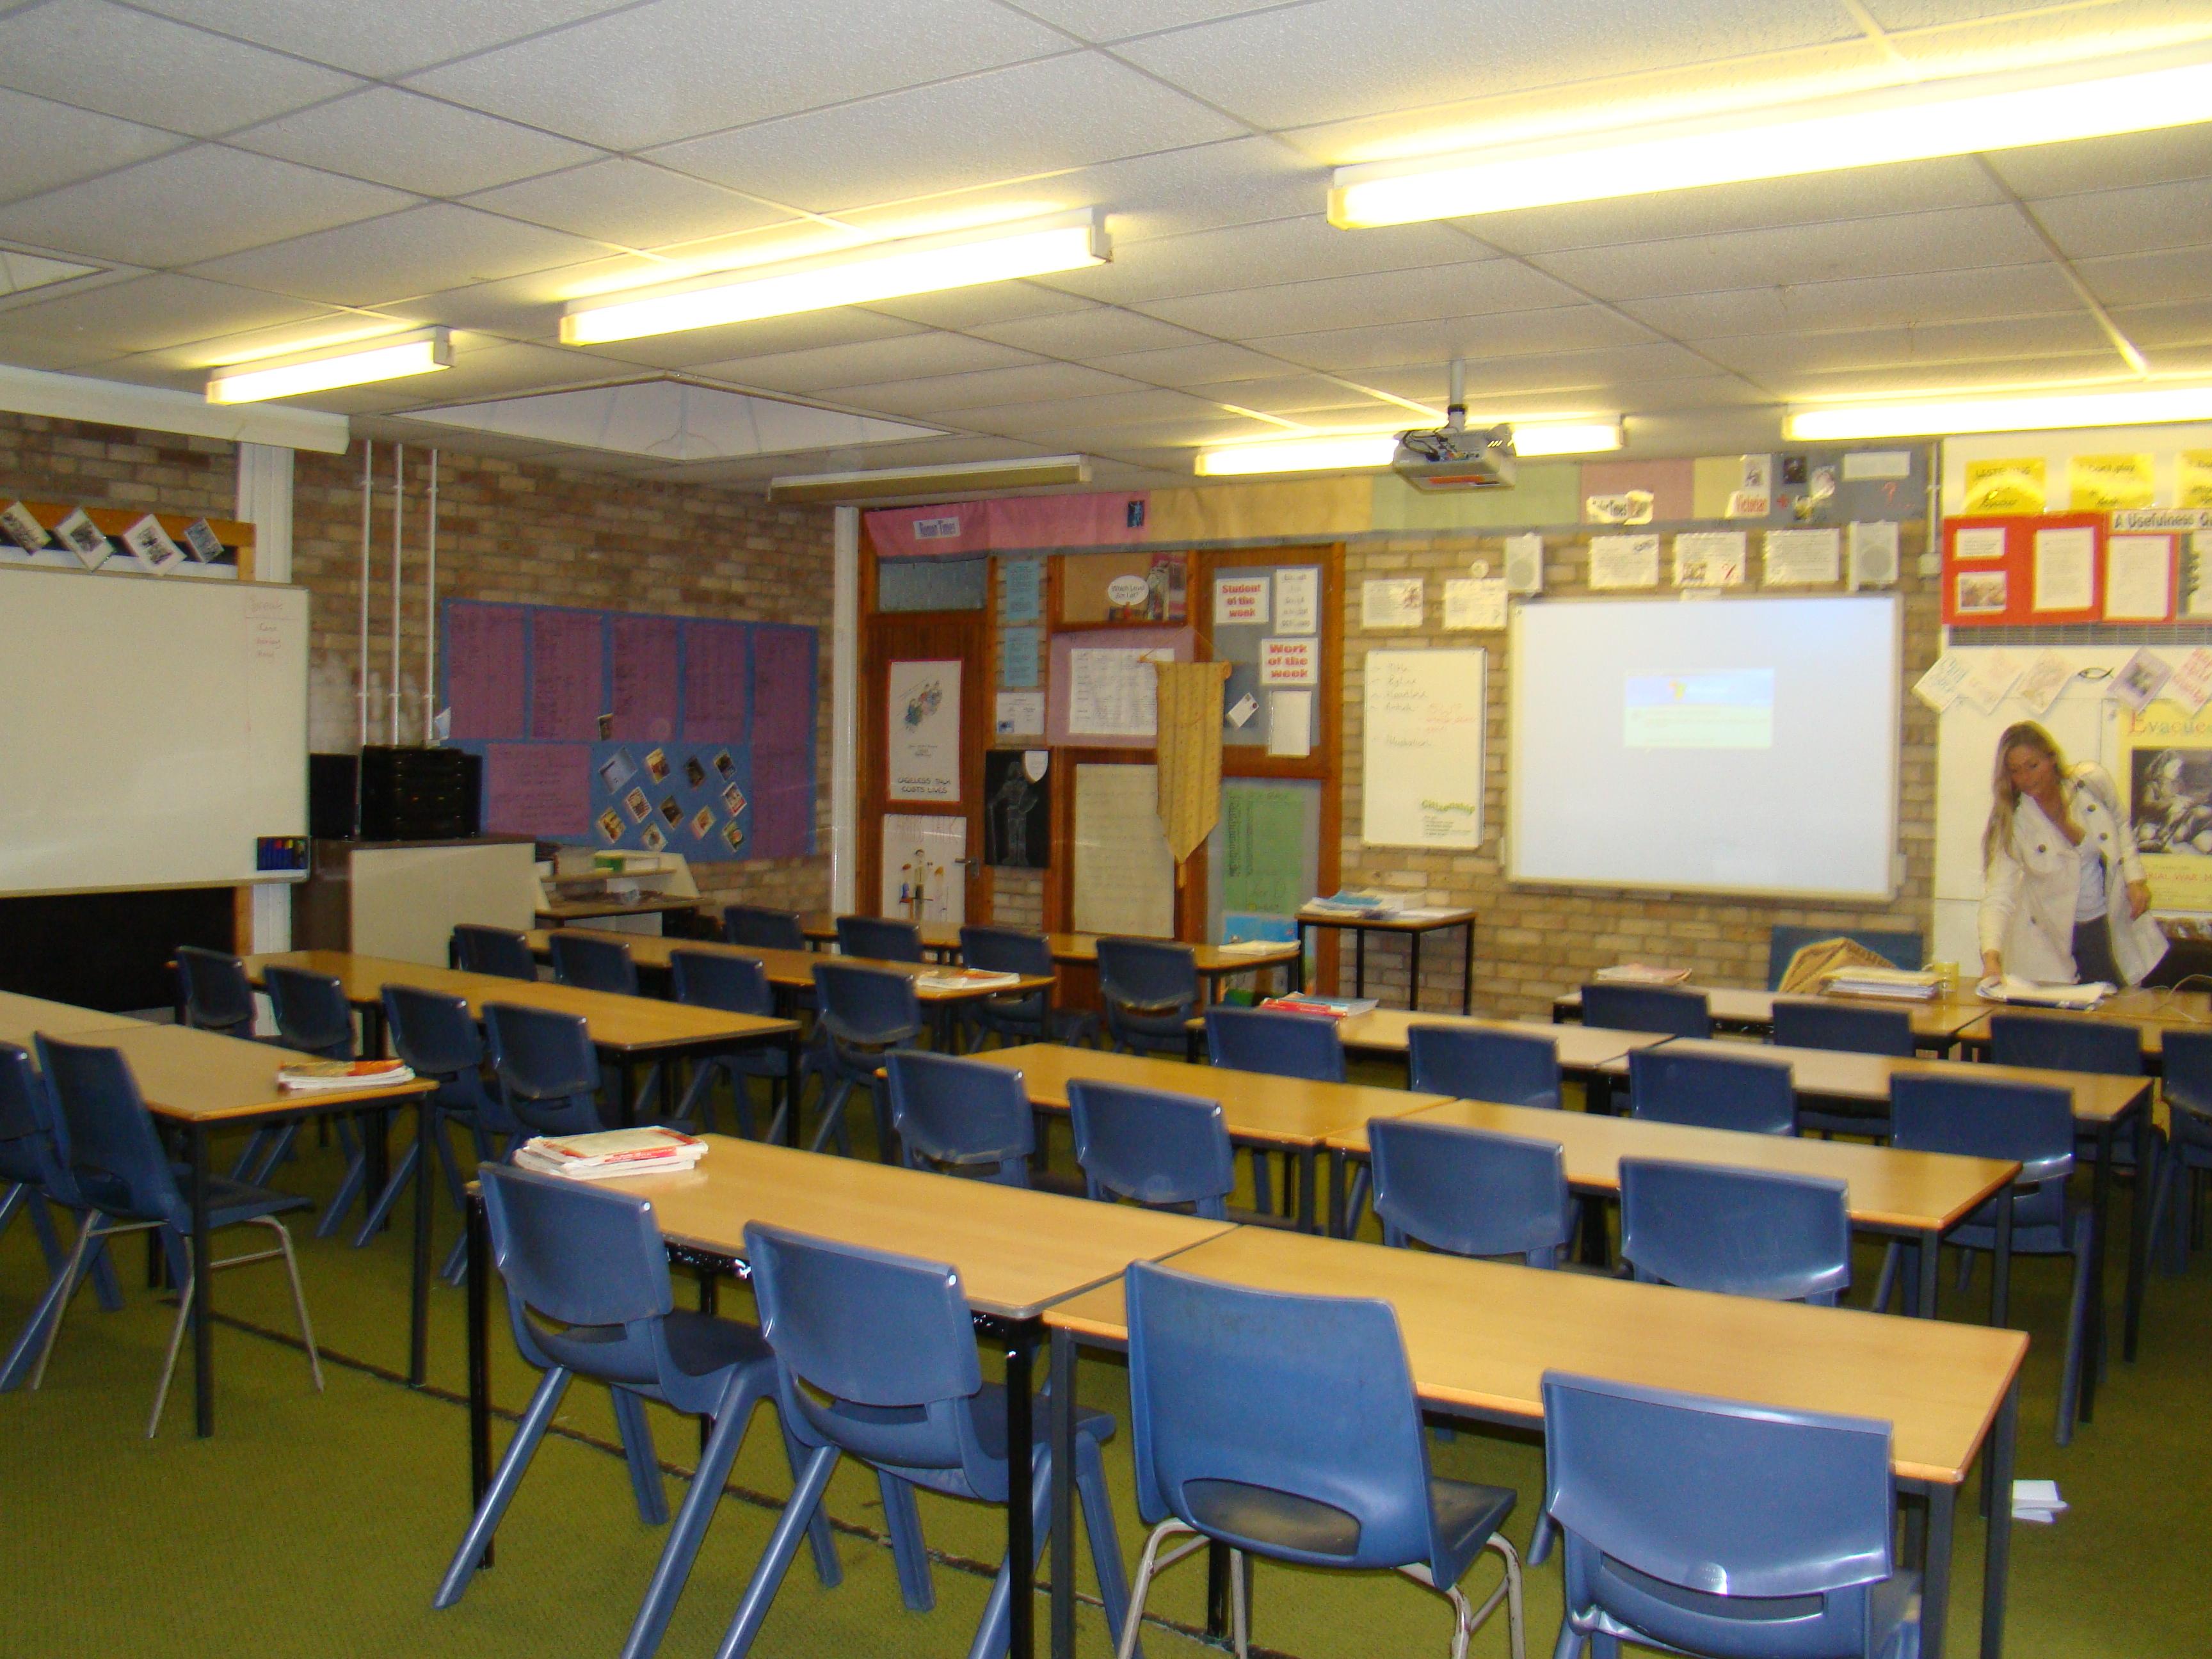 High School Social Studies Classroom Decoration ~ Index of release images users antonio lights sun